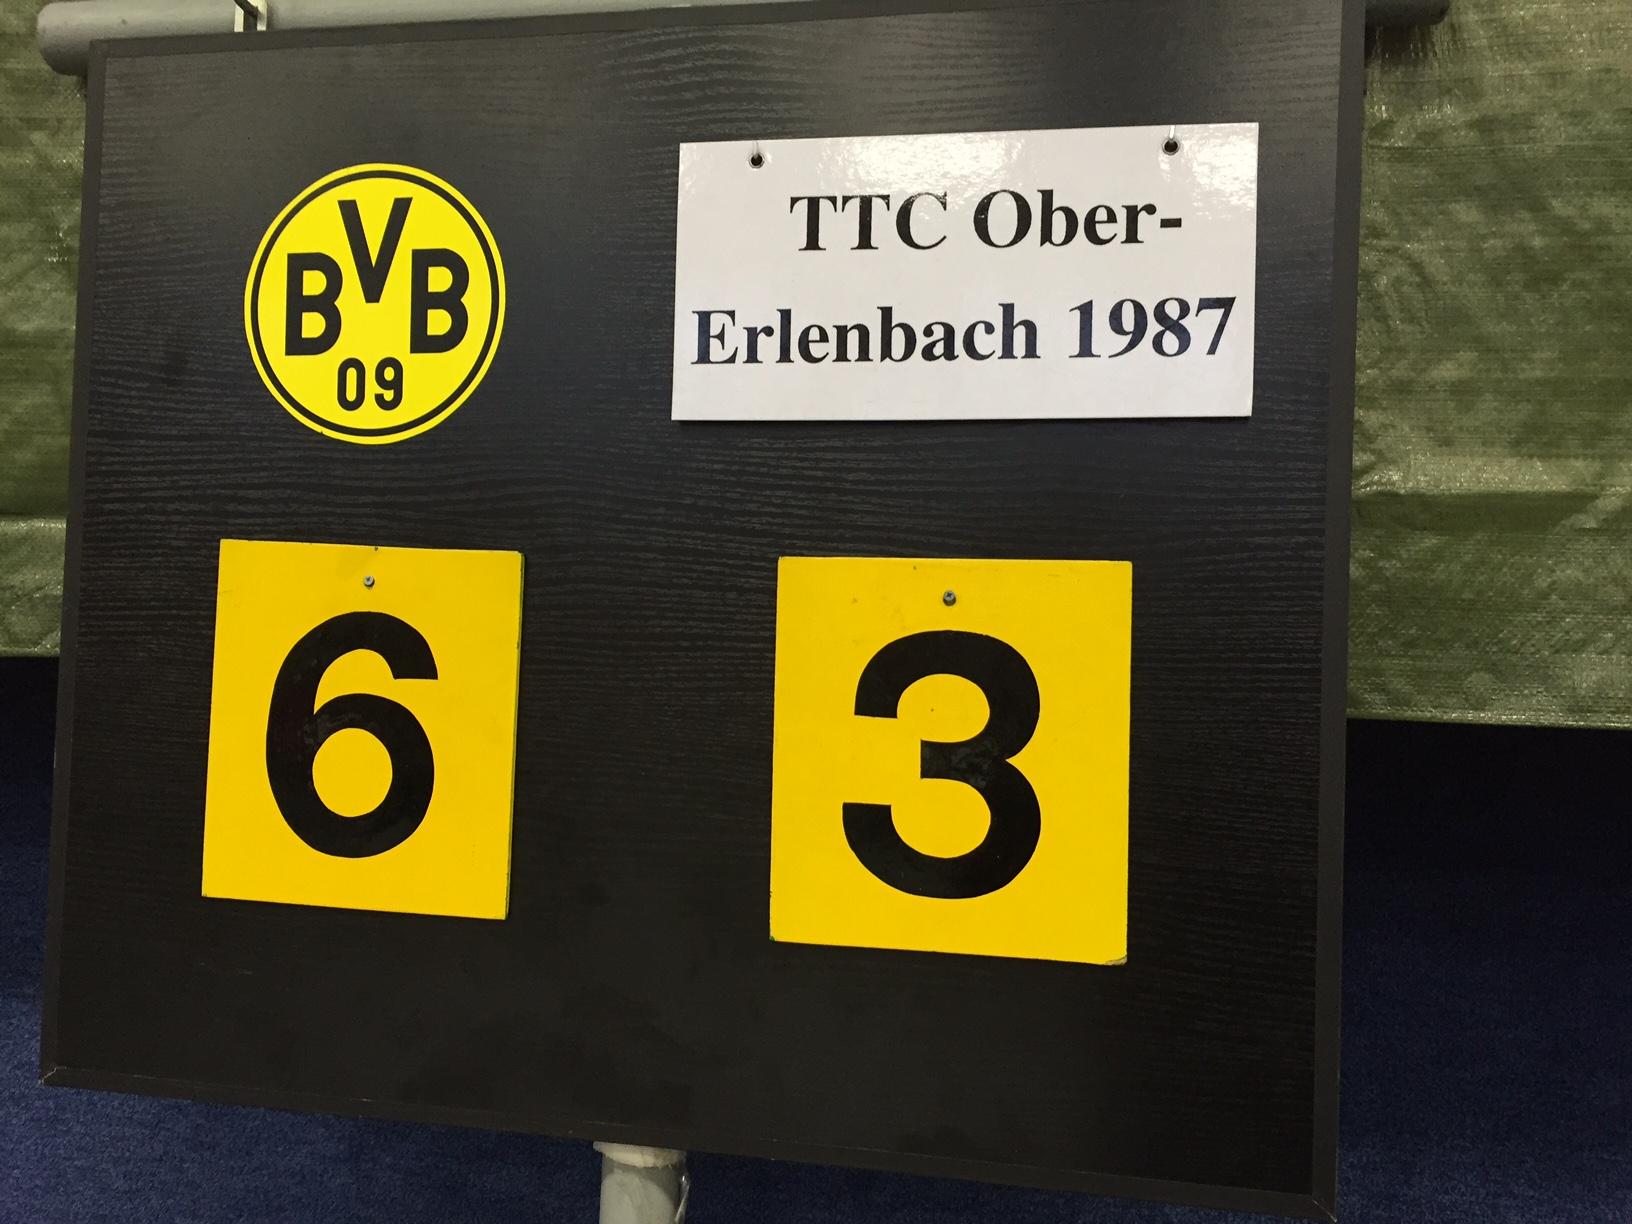 images/Endstand BVB - TTC OE.jpg